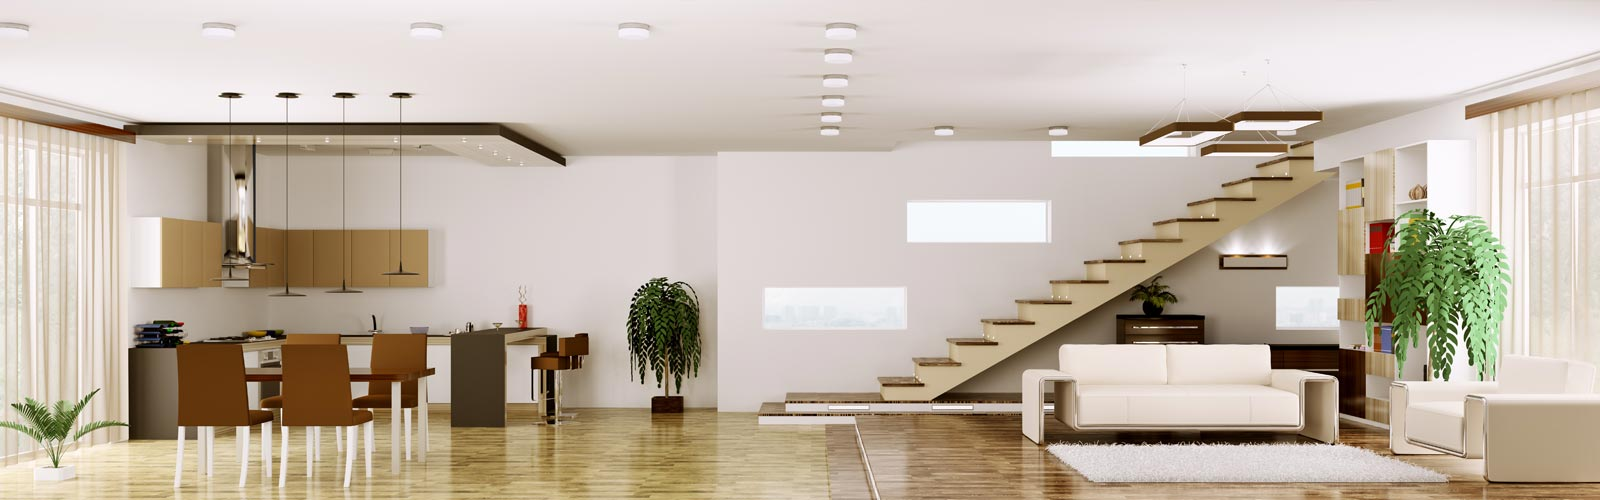 Modernes Wohn-Ess-Zimmer